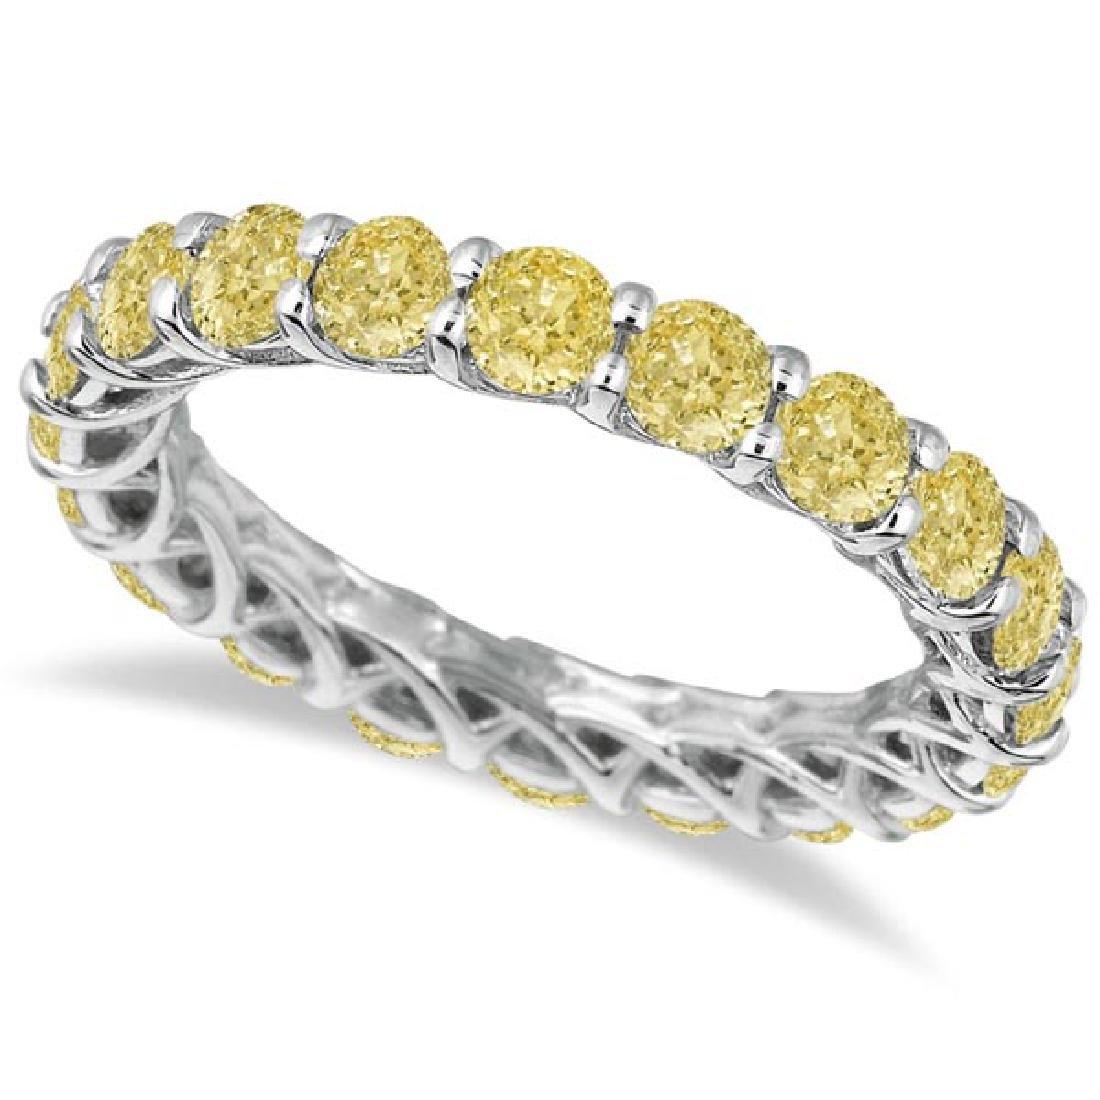 Fancy Yellow Canary Diamond Eternity Ring Band 14k Whit